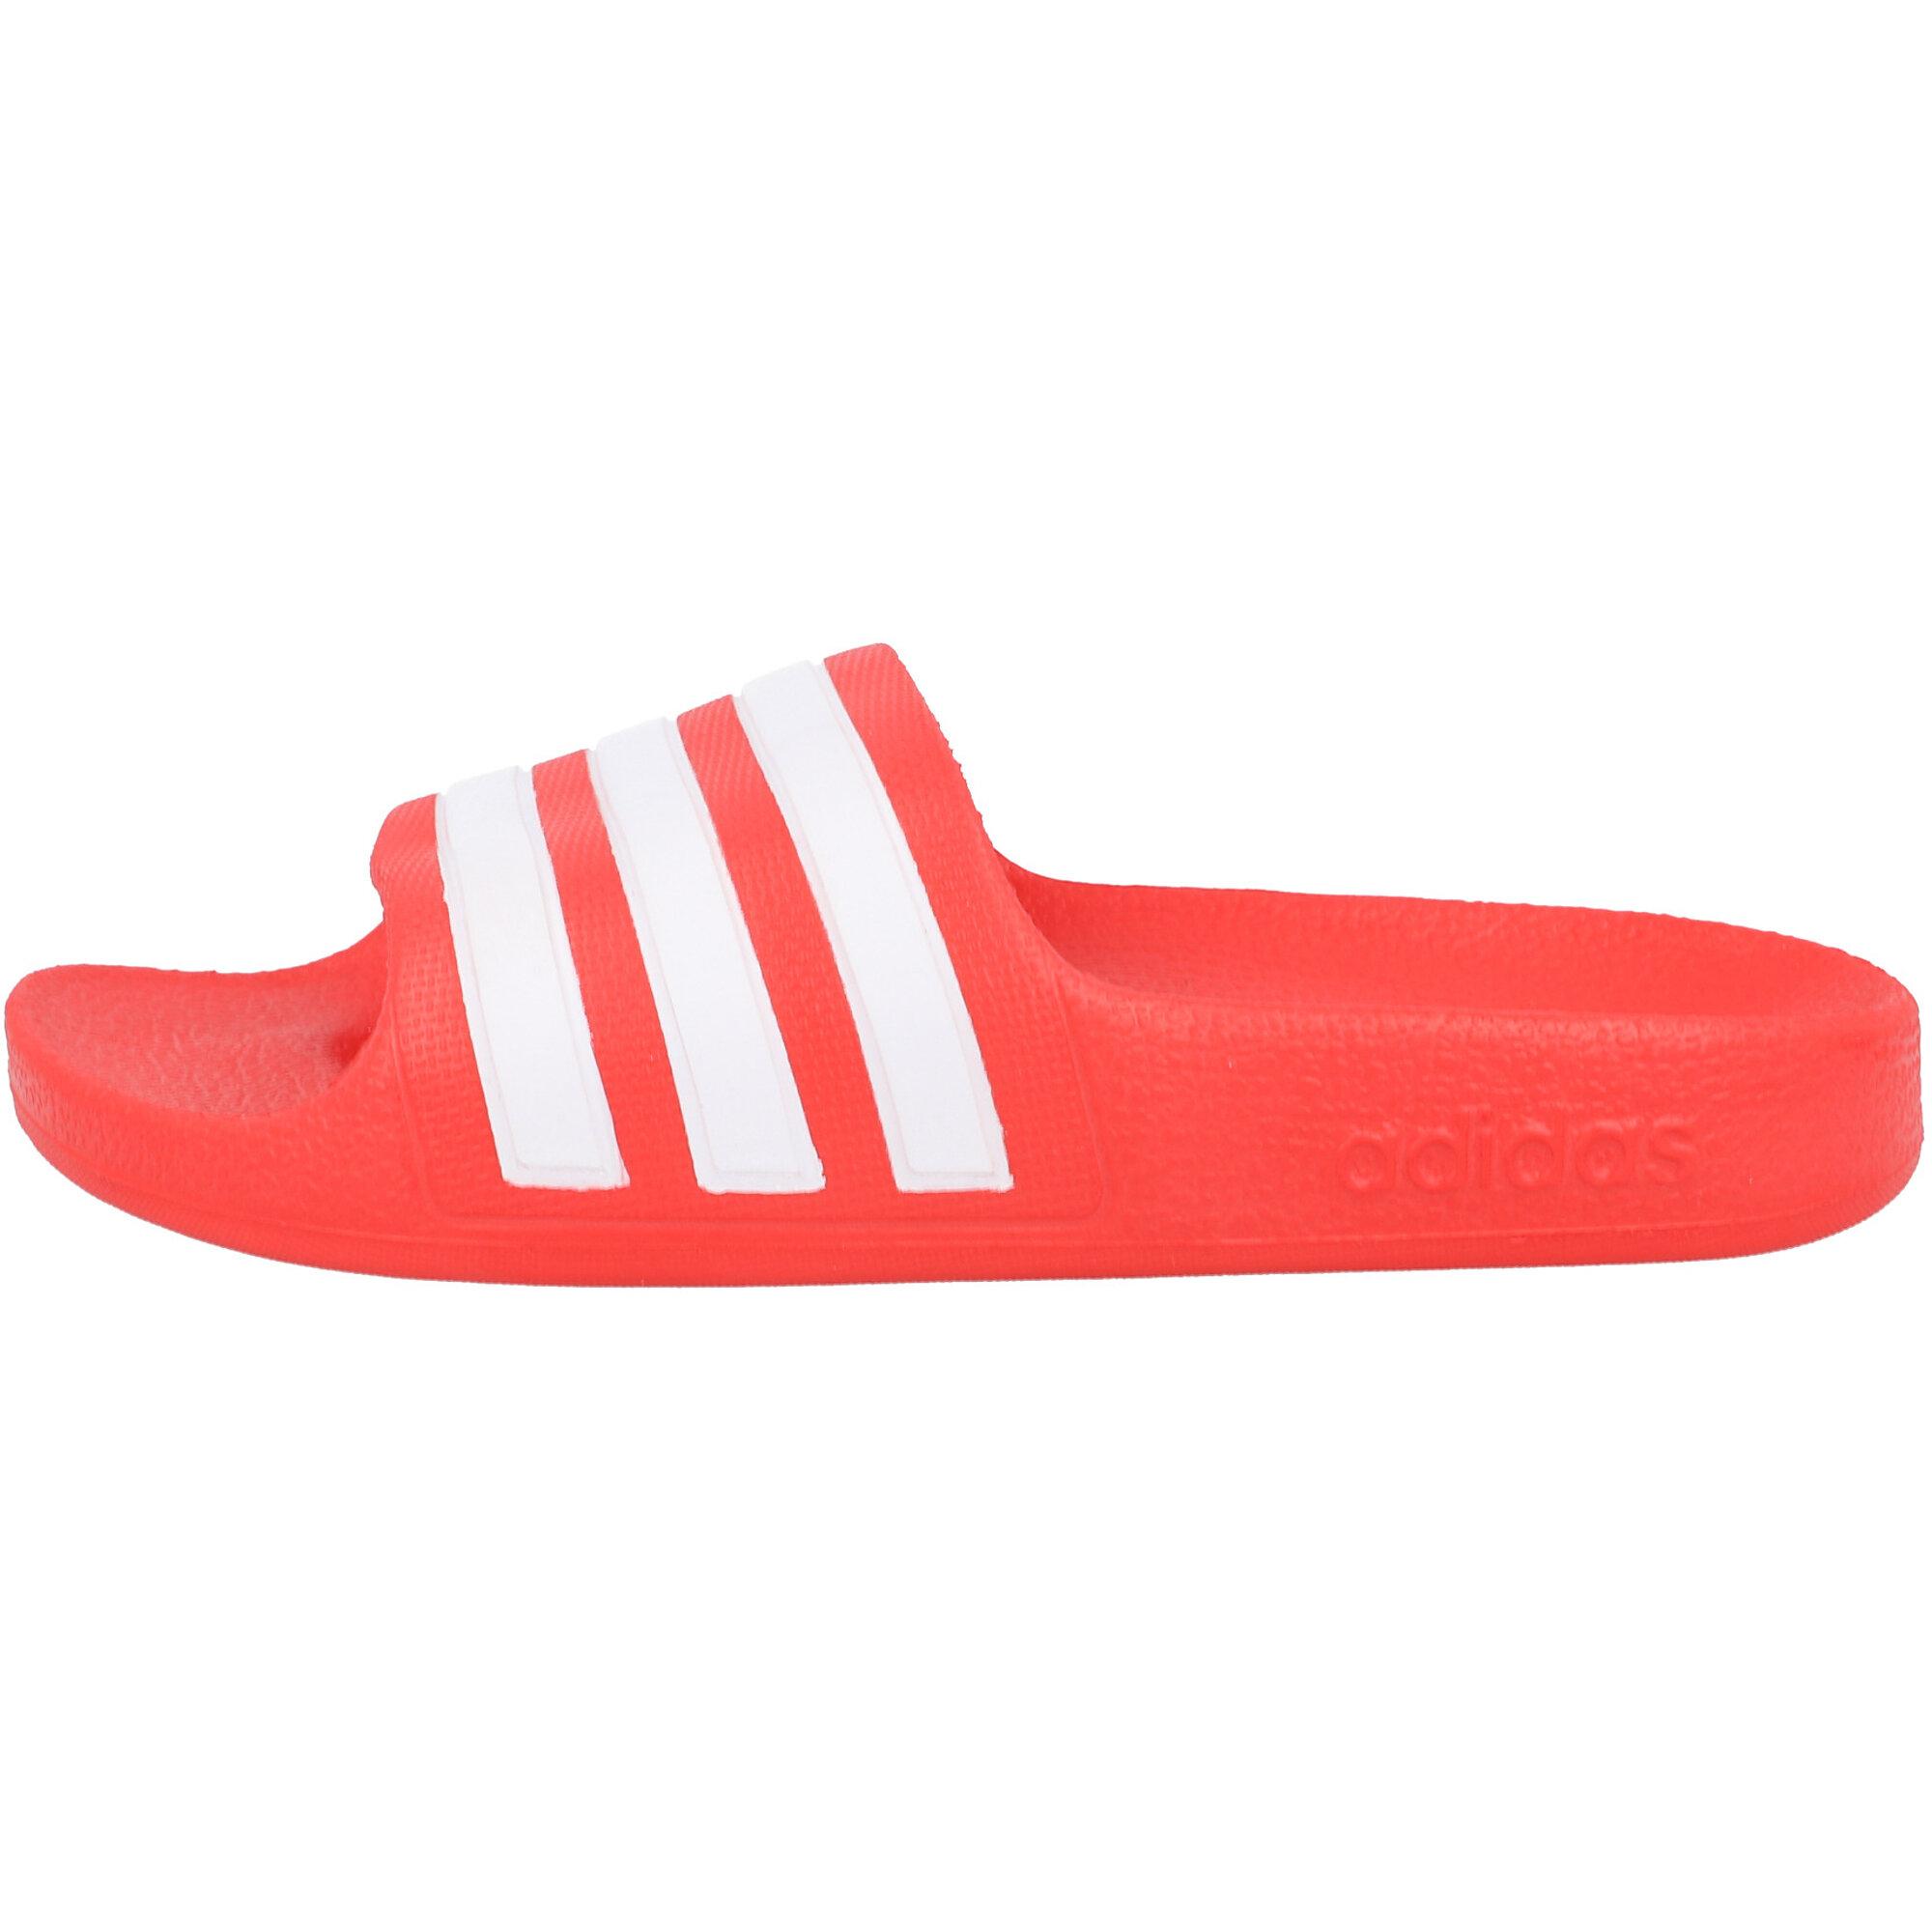 adidas adilette Aqua K Red/White Synthetic